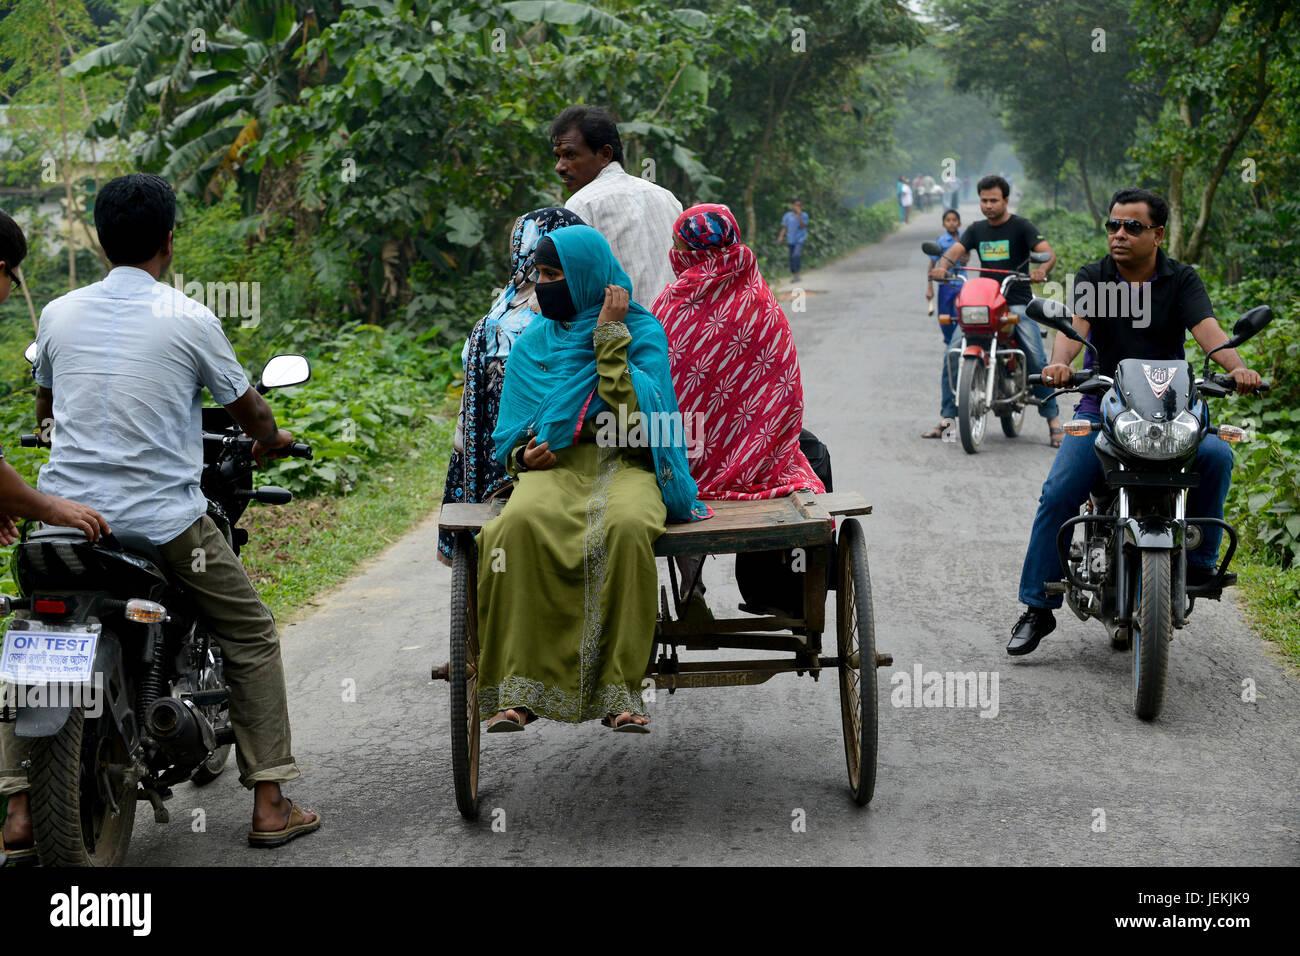 BANGLADESH, Tangail, transport by bicycle rikshaw / BANGLADESCH, Distrikt Tangail, Kalihati, Transport per Fahrradrikscha - Stock Image